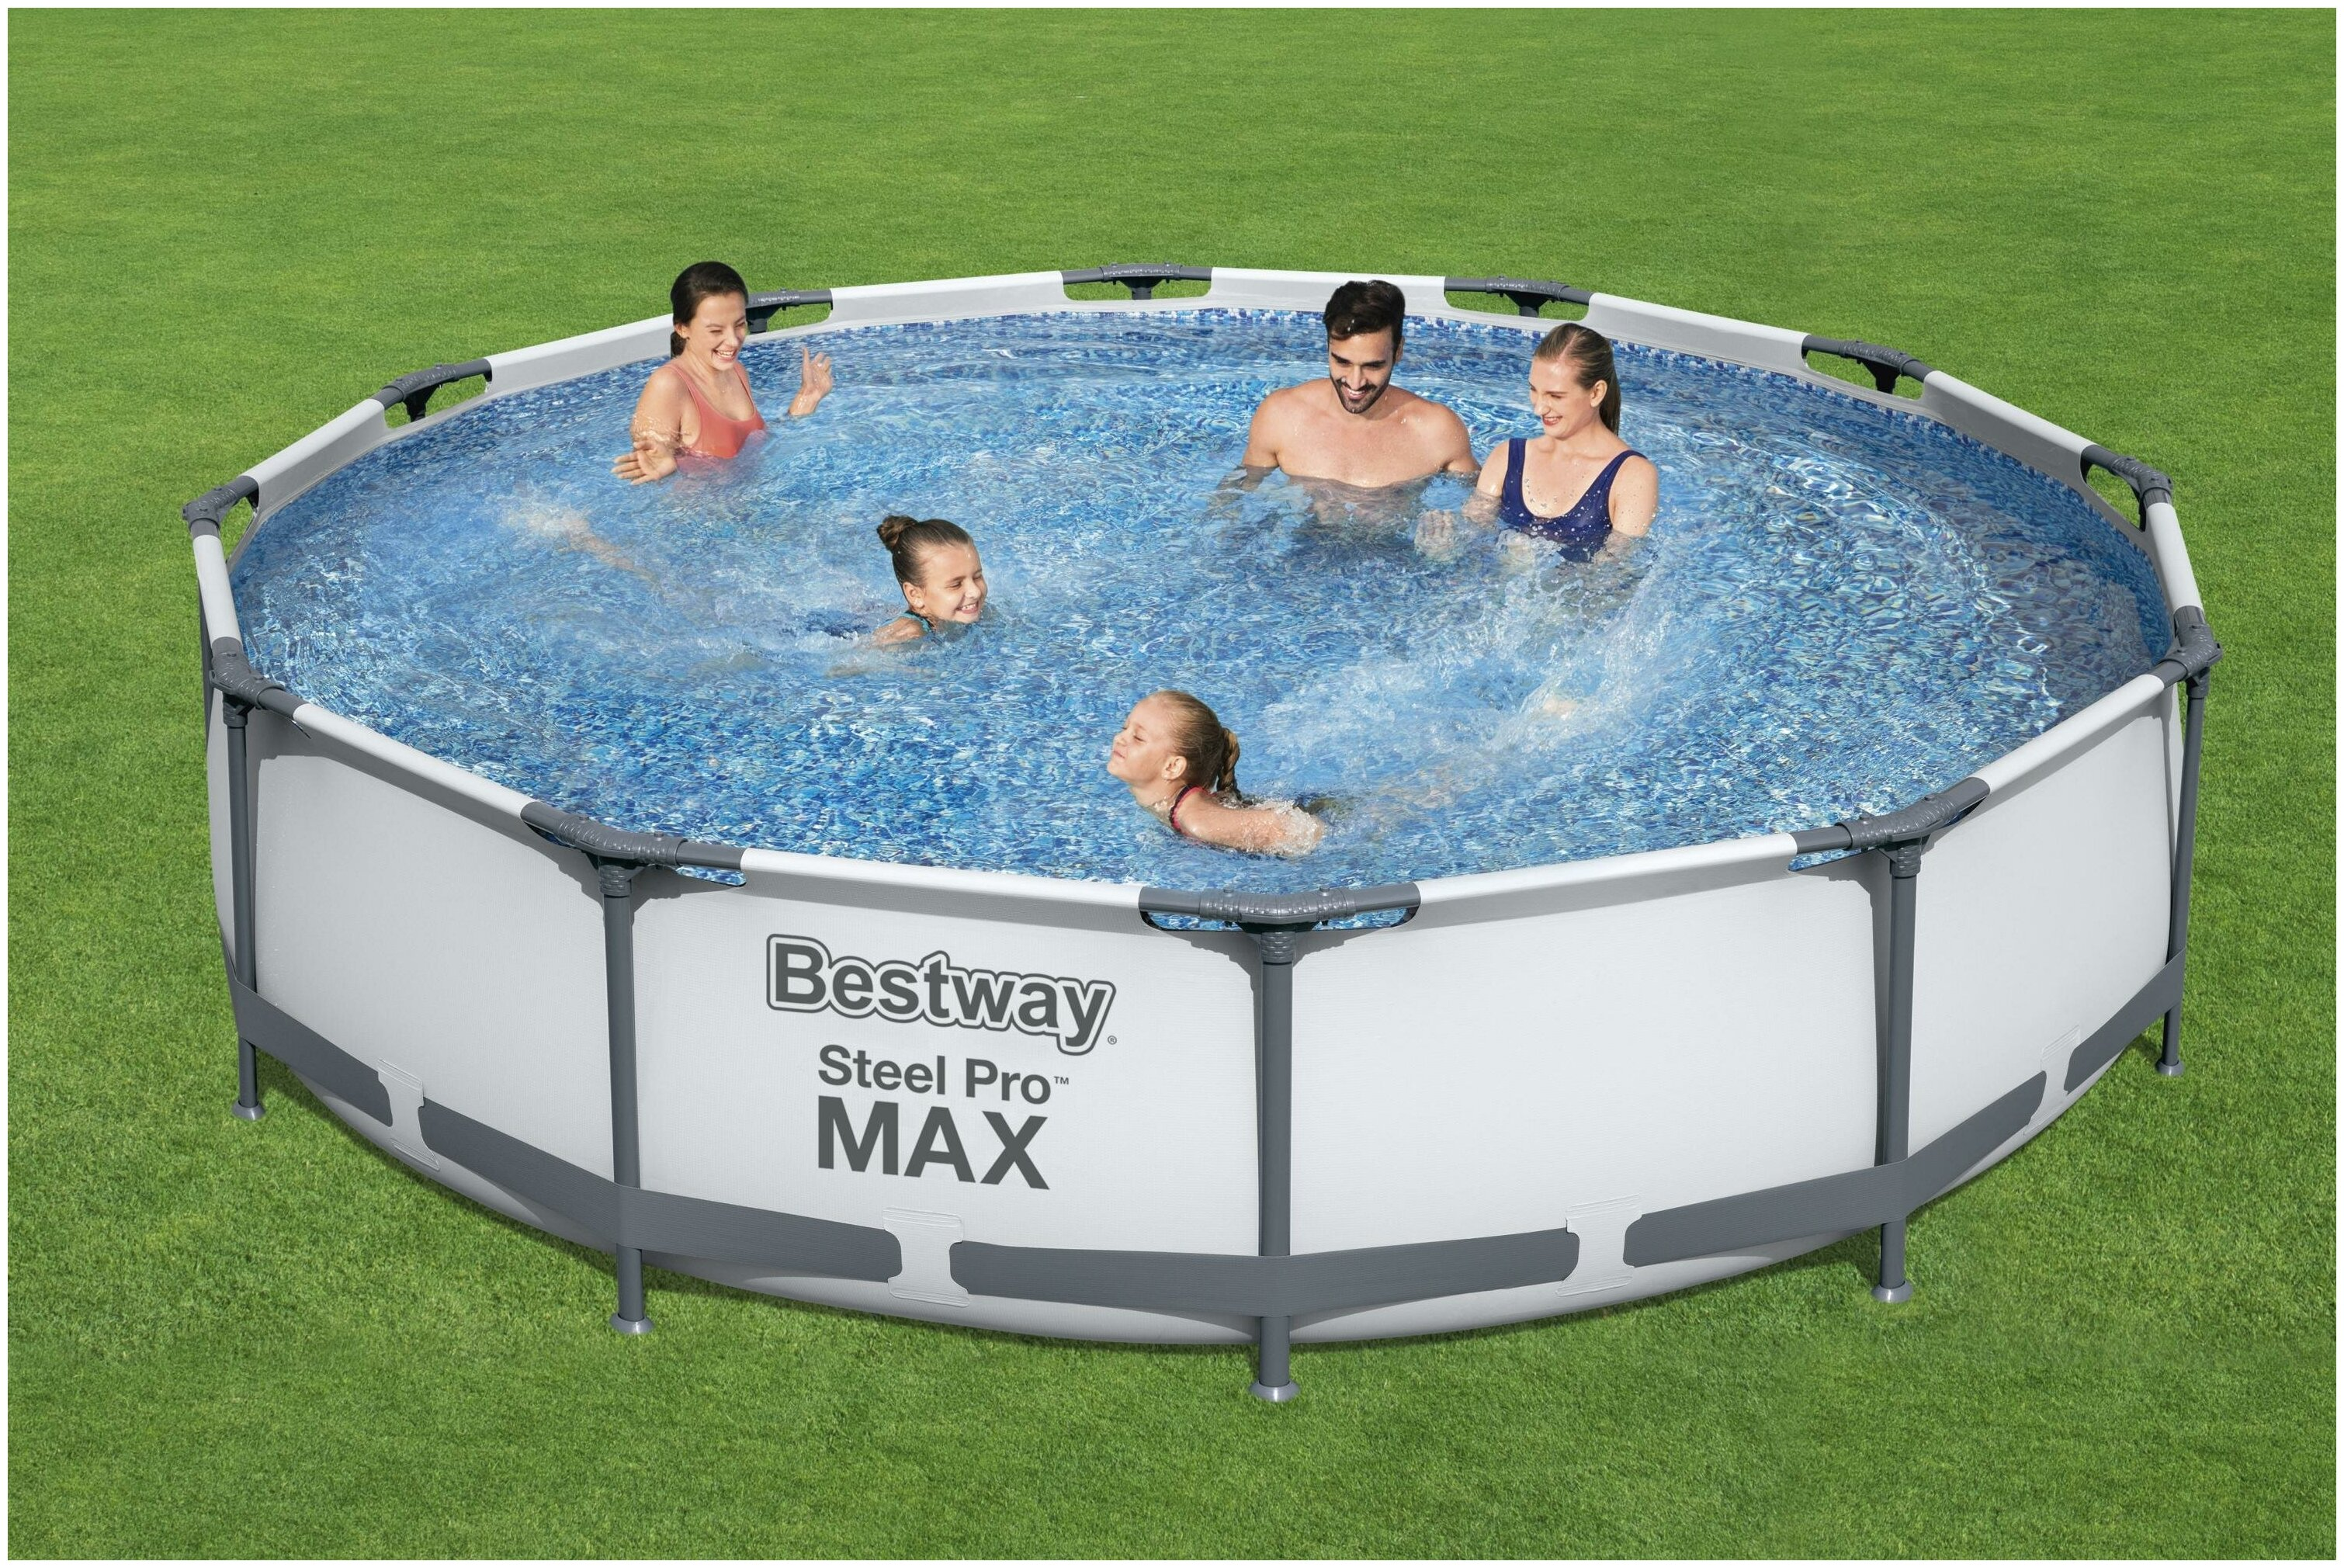 Бассейн Bestway Steel Pro MAX 56416/56062